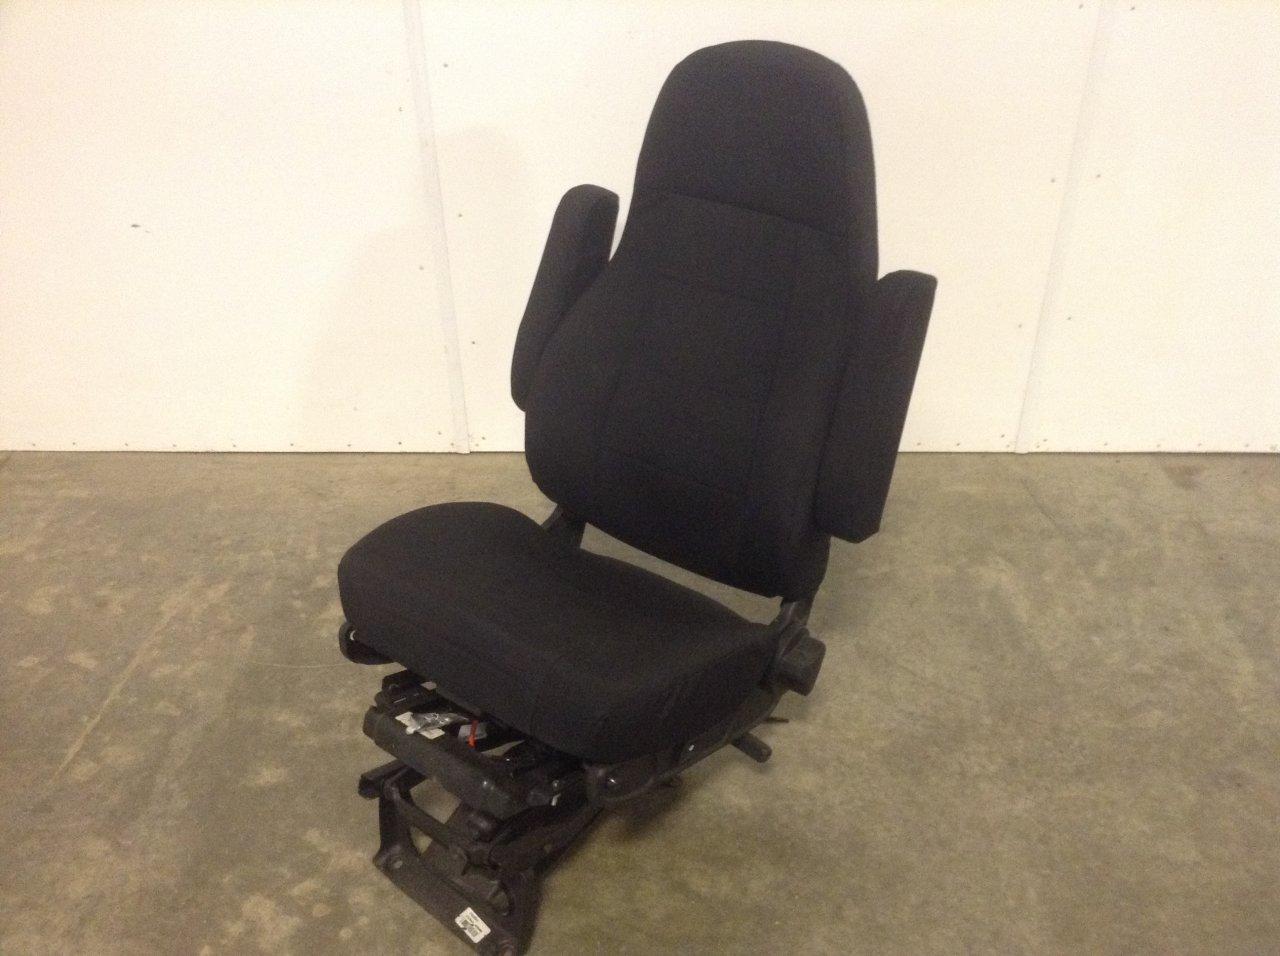 FREIGHTLINER M2 106 Seat, Air Ride